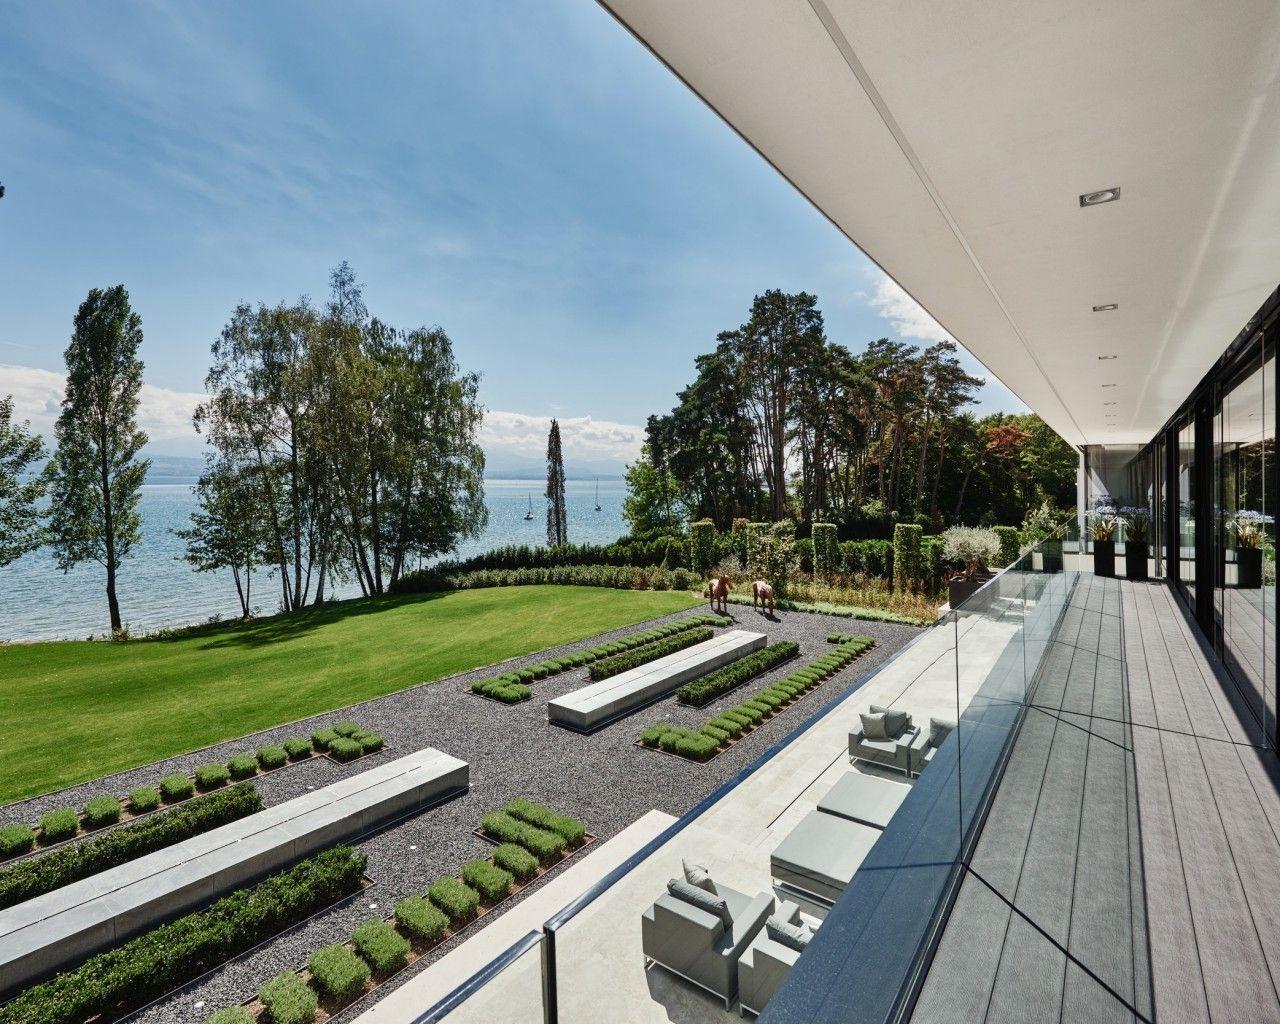 Switzerland lakeside villa